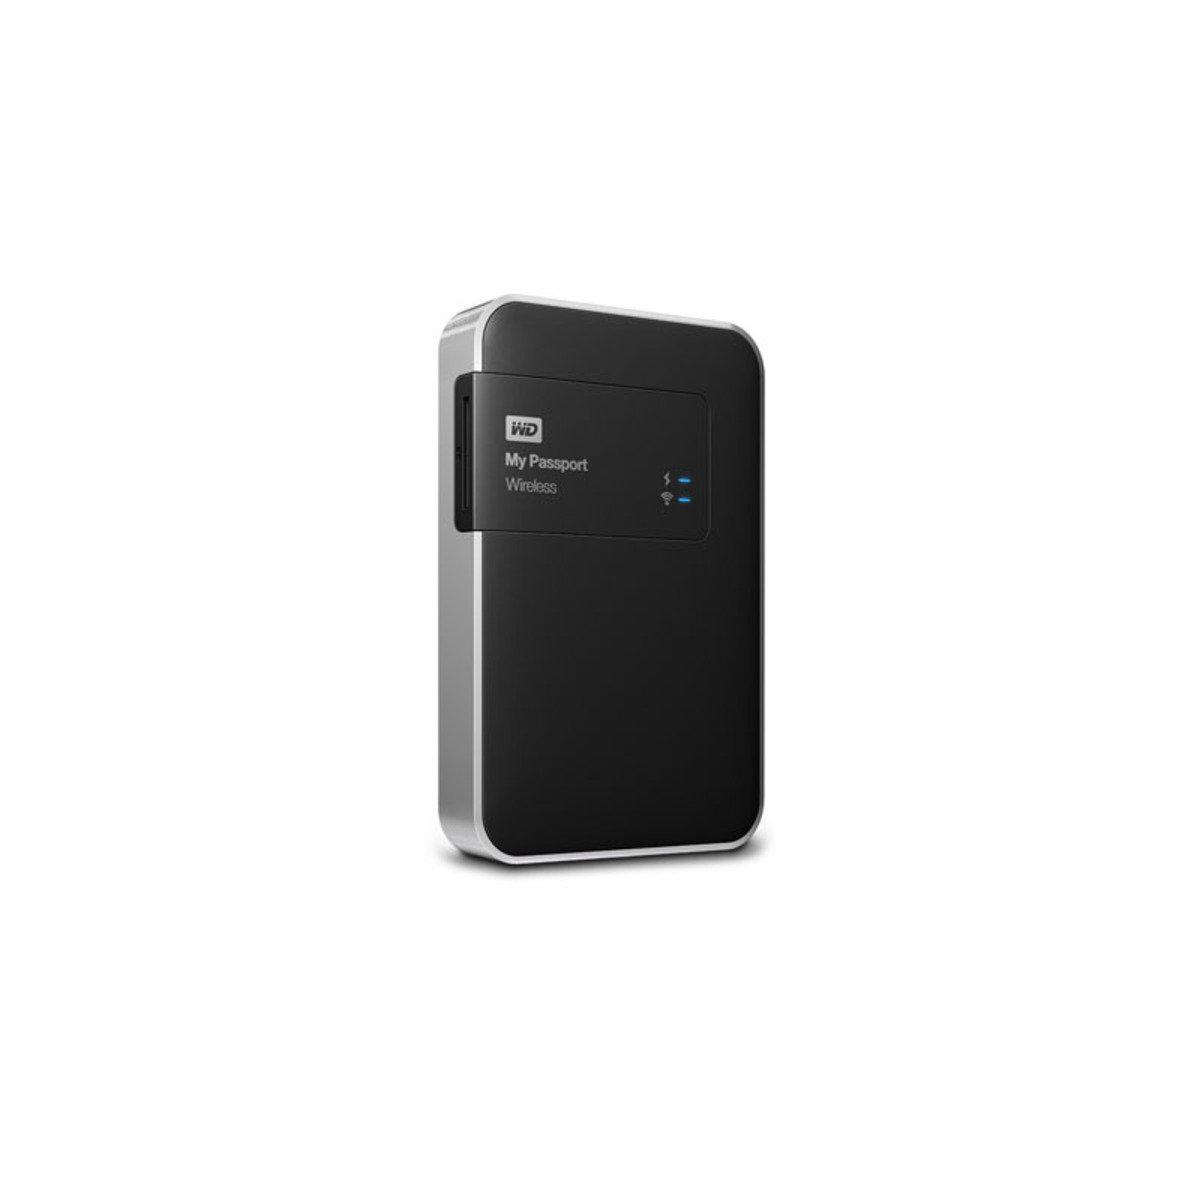 My Passport Wireless 1TB 充電式無線外置硬碟 BK8Z0010BBK